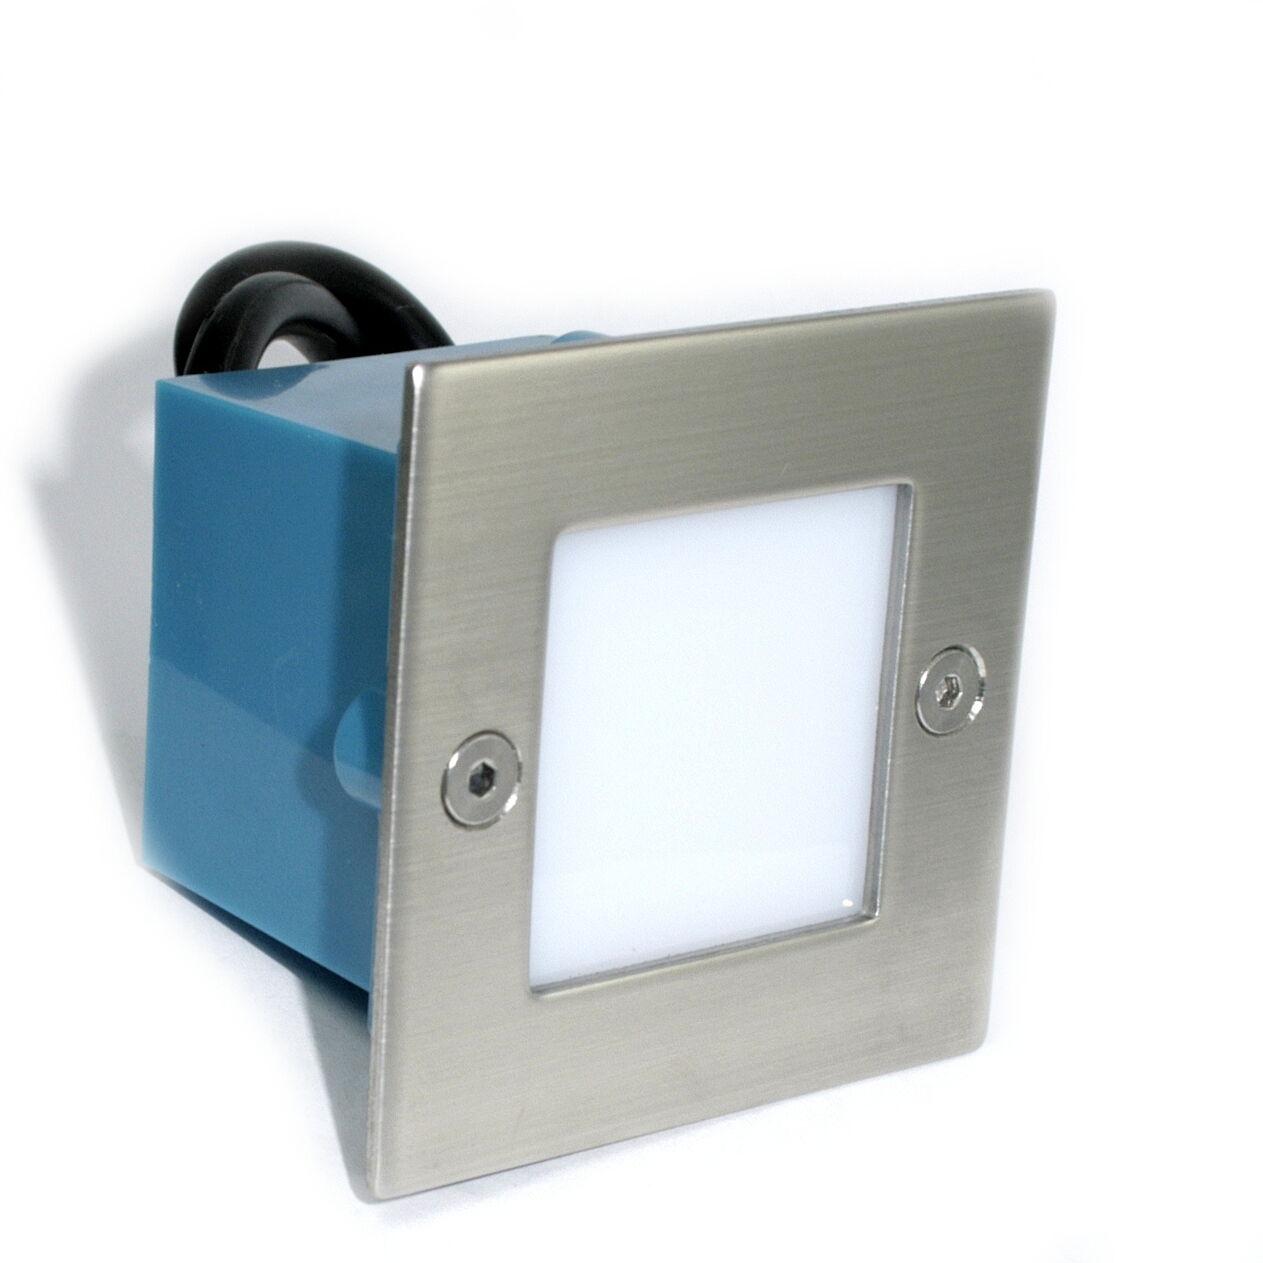 10er Set LED Einbaustrahler Leon 230Volt 1.5Watt IP54 Quadratische Stufenspots